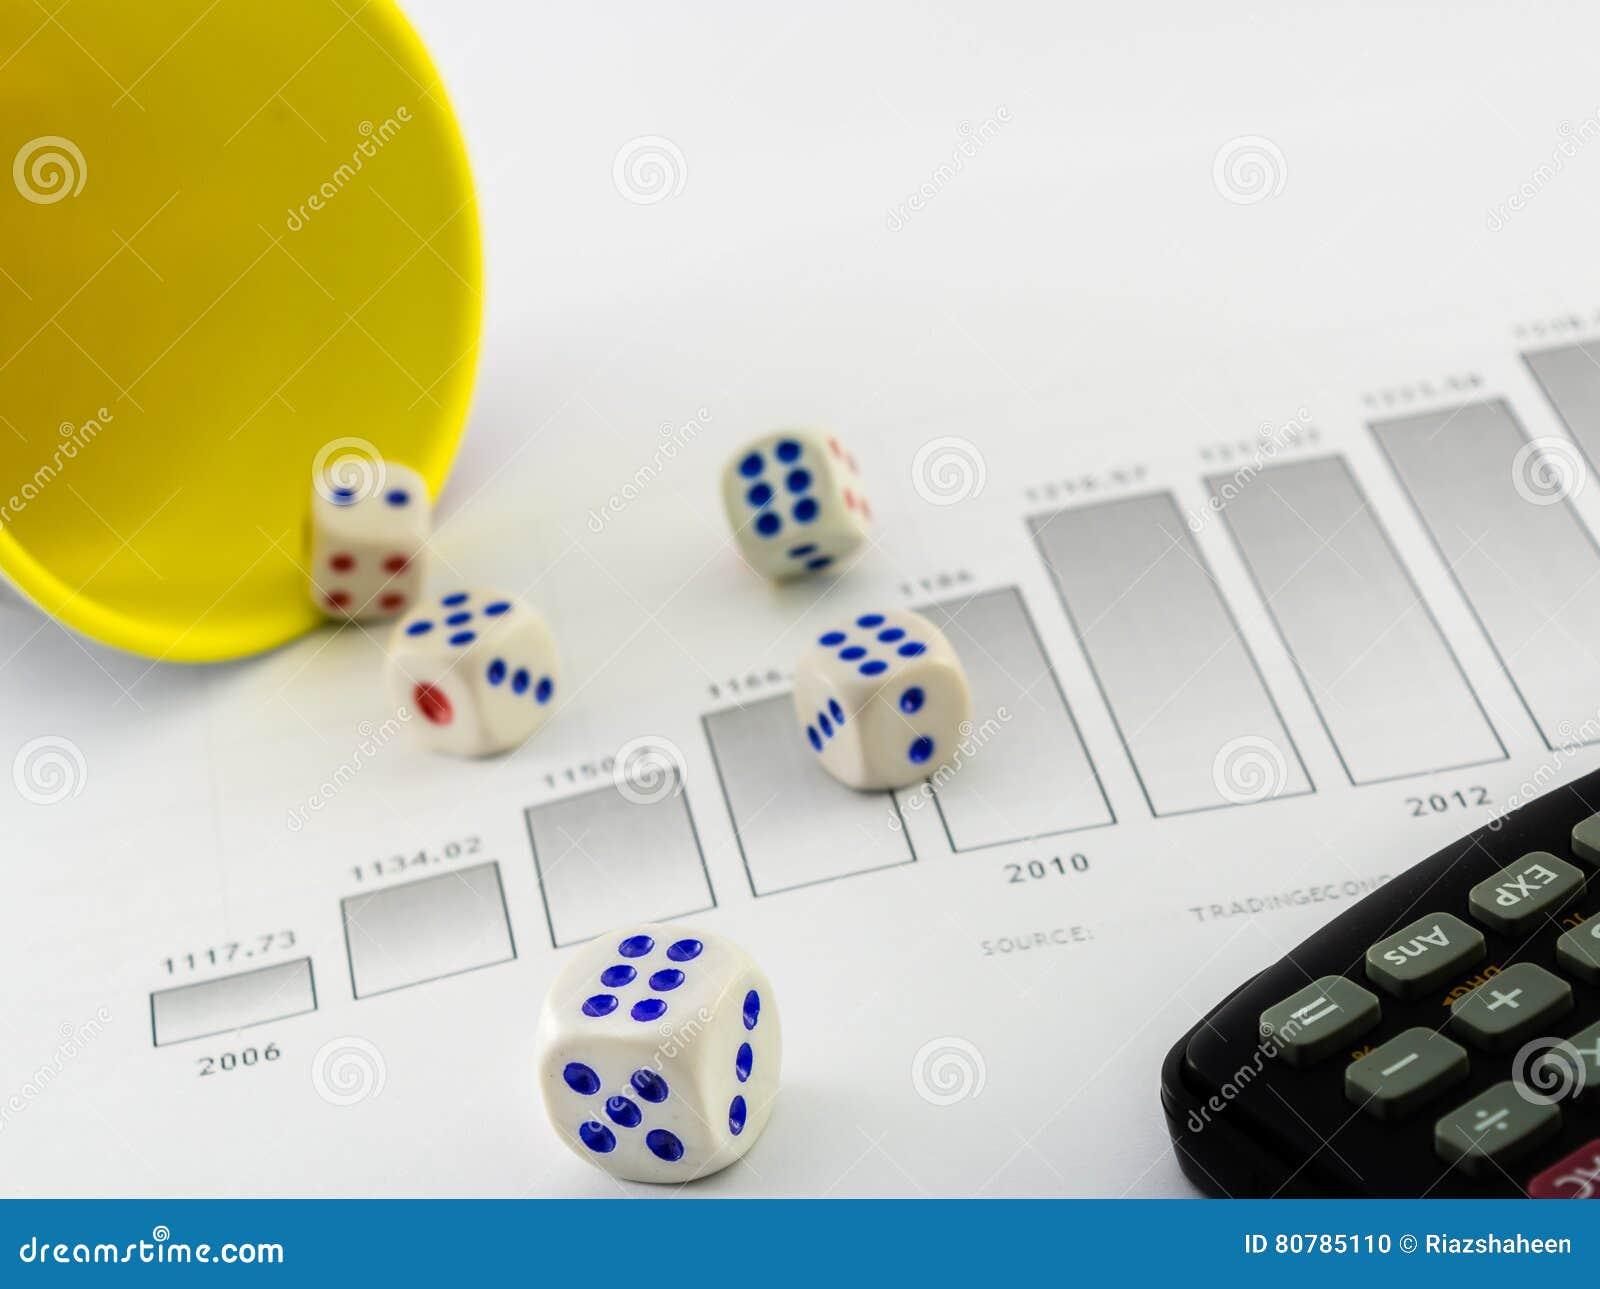 Market Analysis With,probability,dice,histogram,calculus,etc